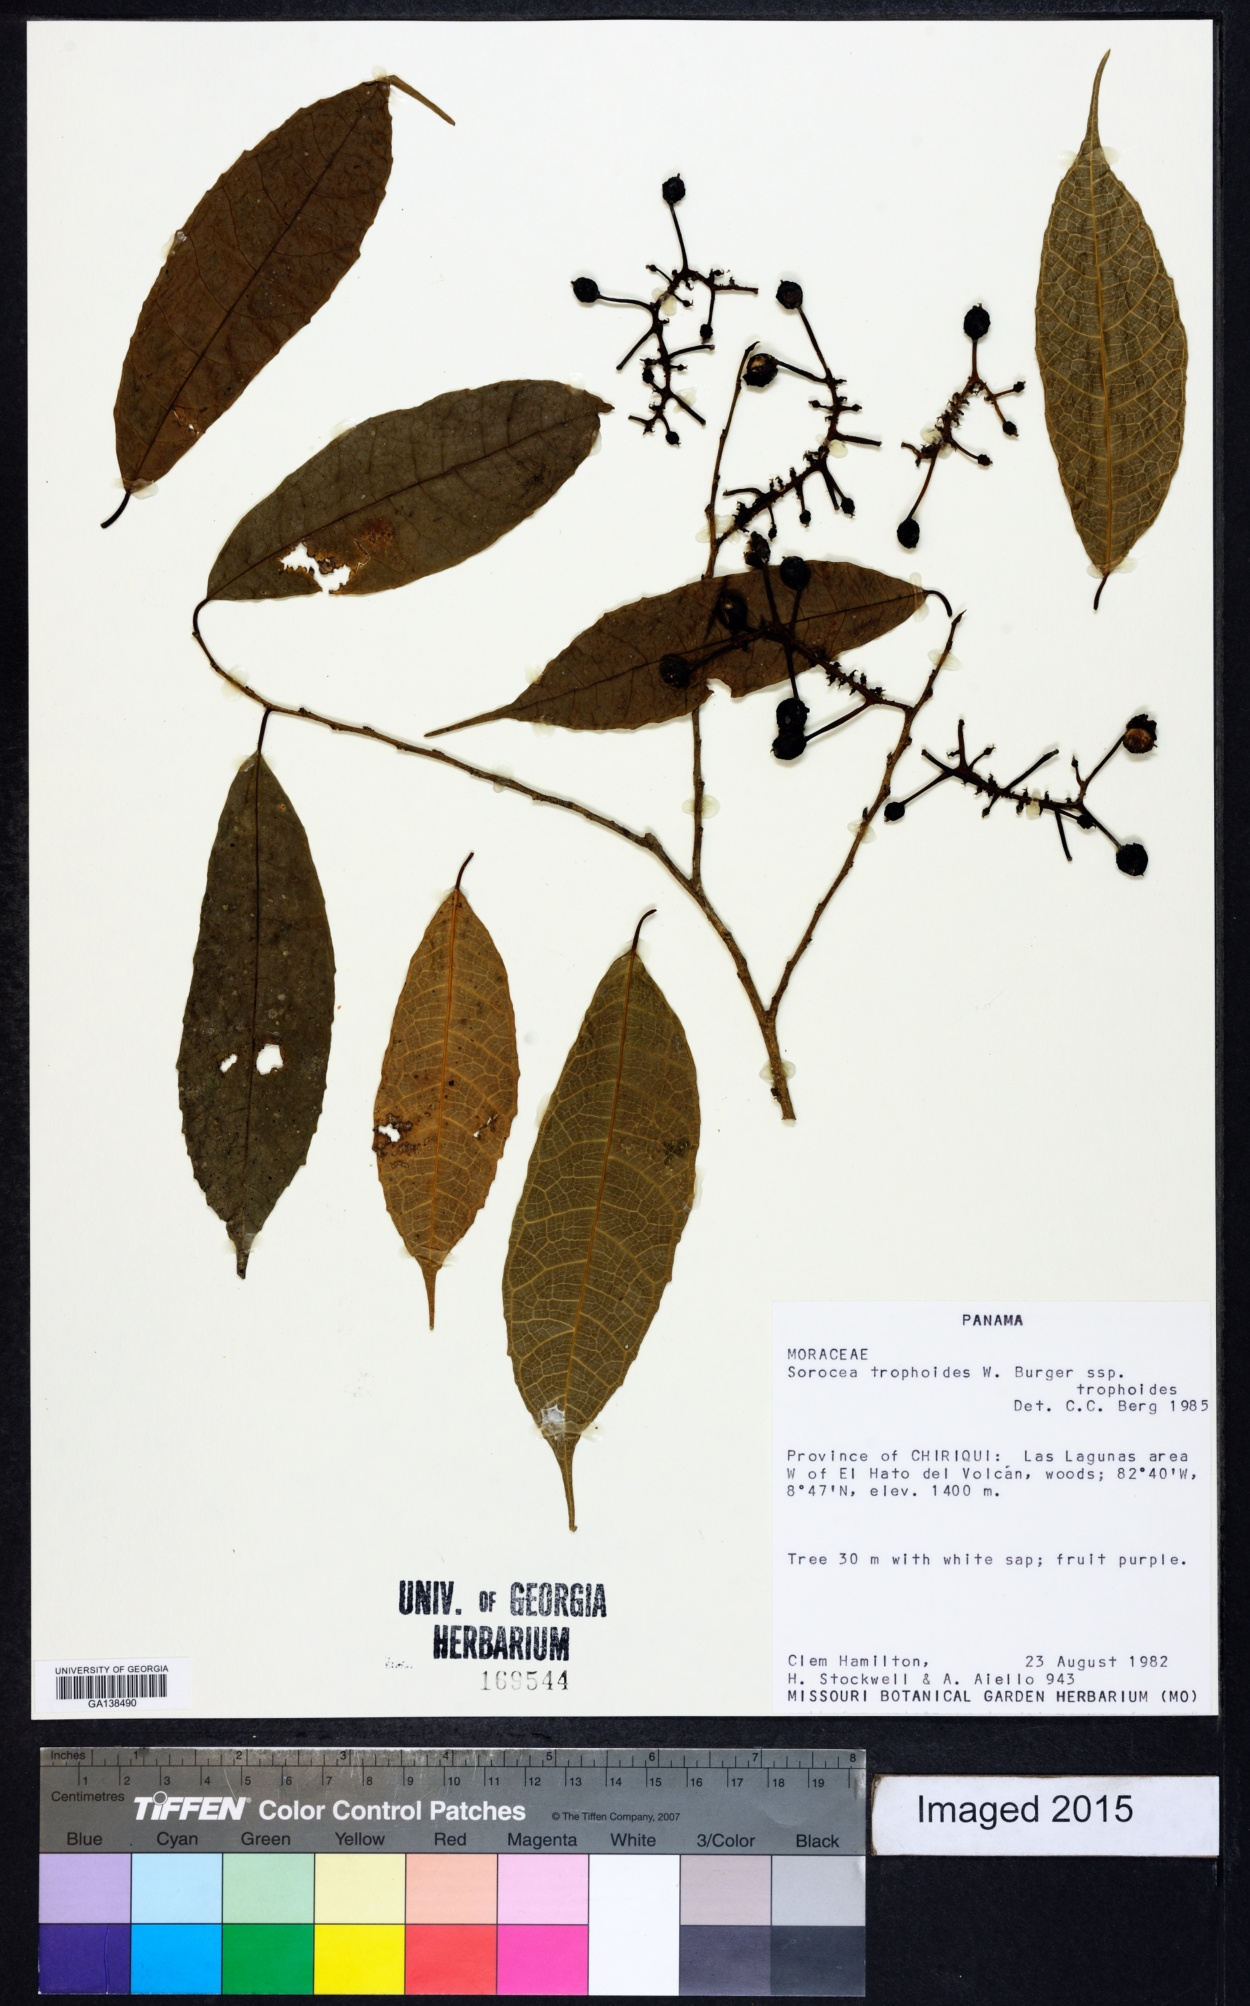 Sorocea trophoides image